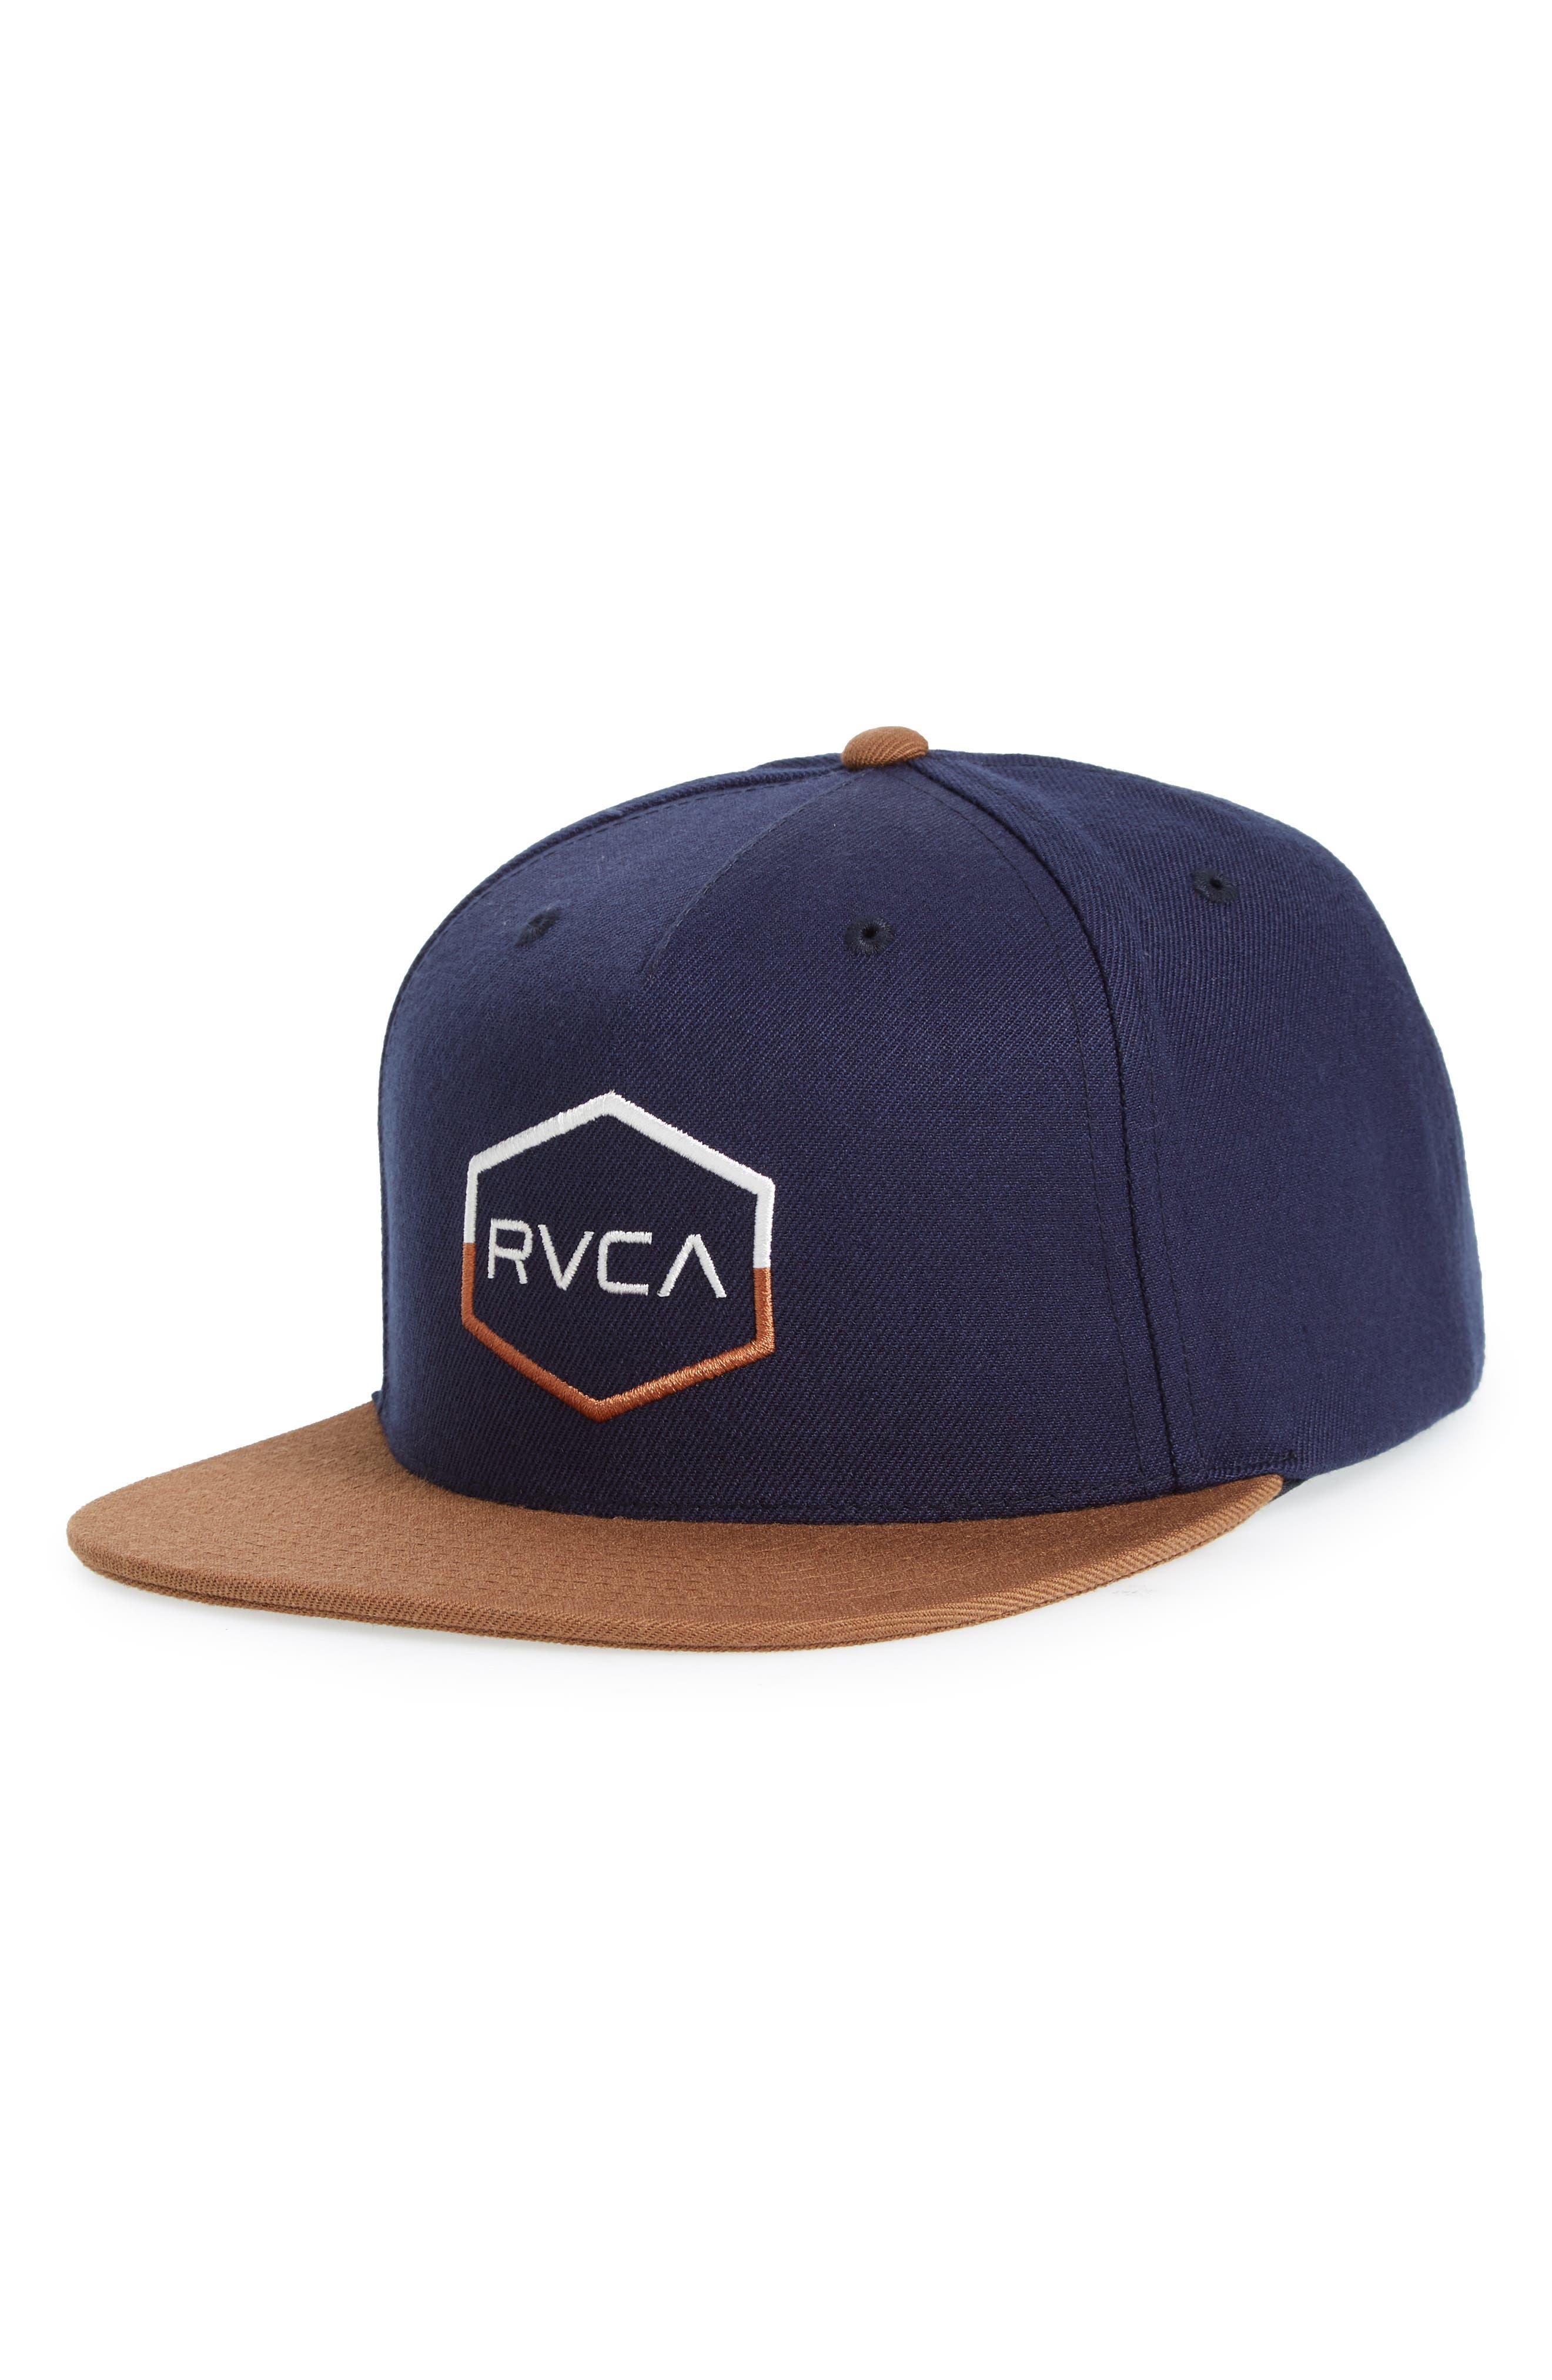 RVCA Commonwealth III Snapback Hat